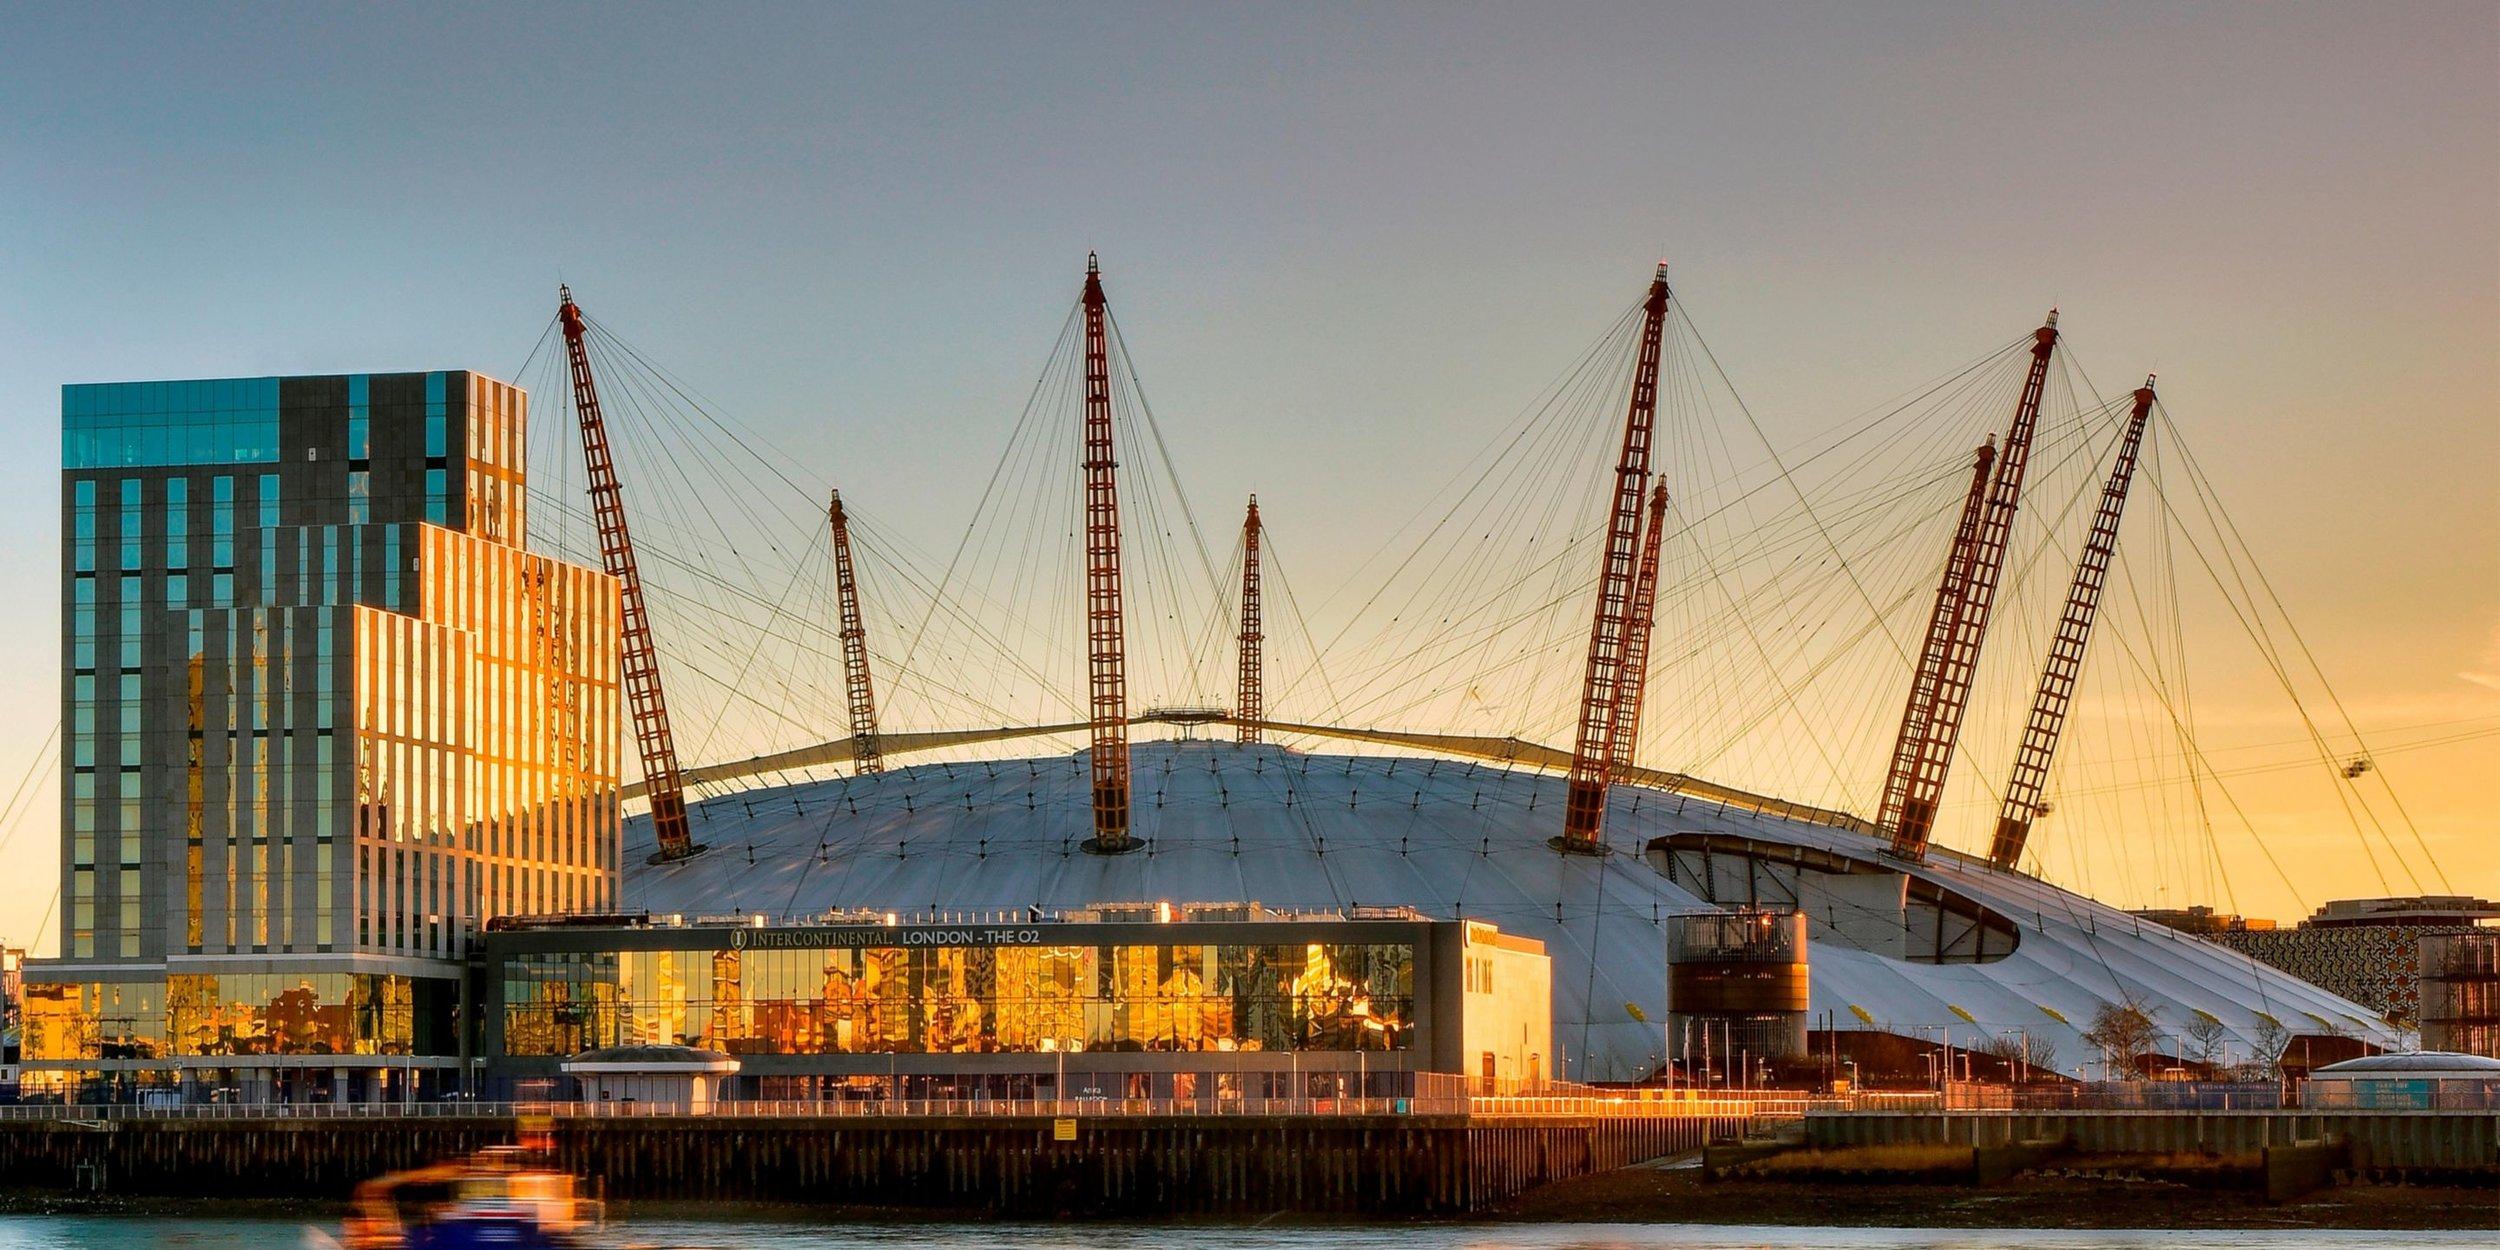 intercontinental-london-5413491020-2x1.jpg